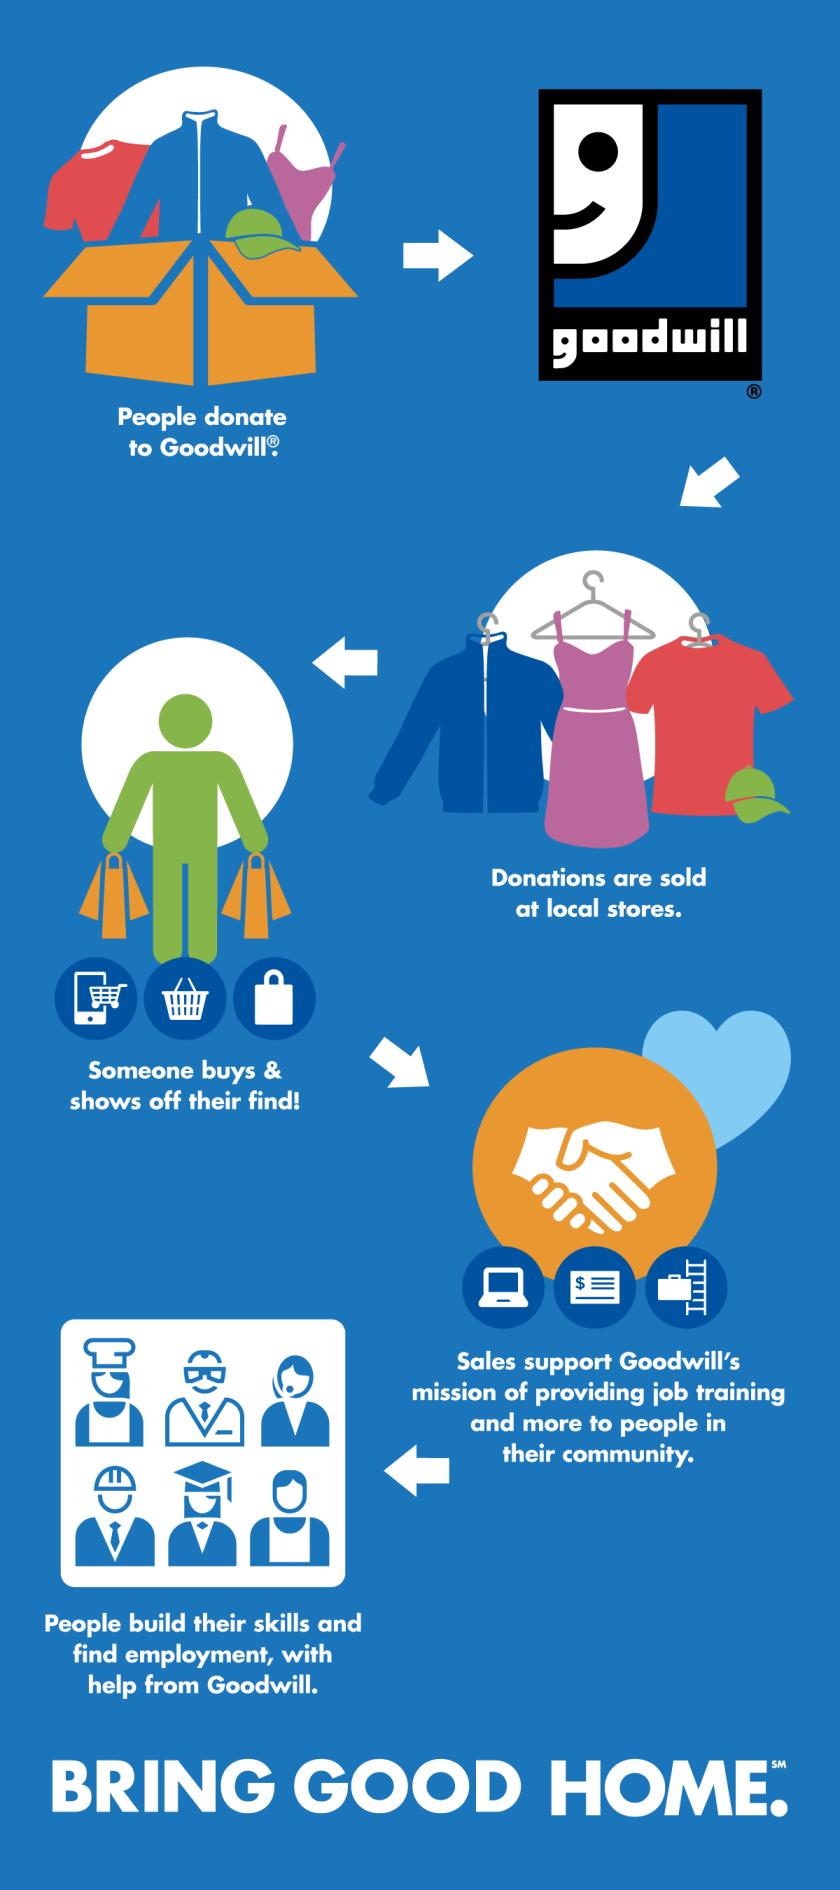 BGH_PSA_Campaign_Infographic_Web